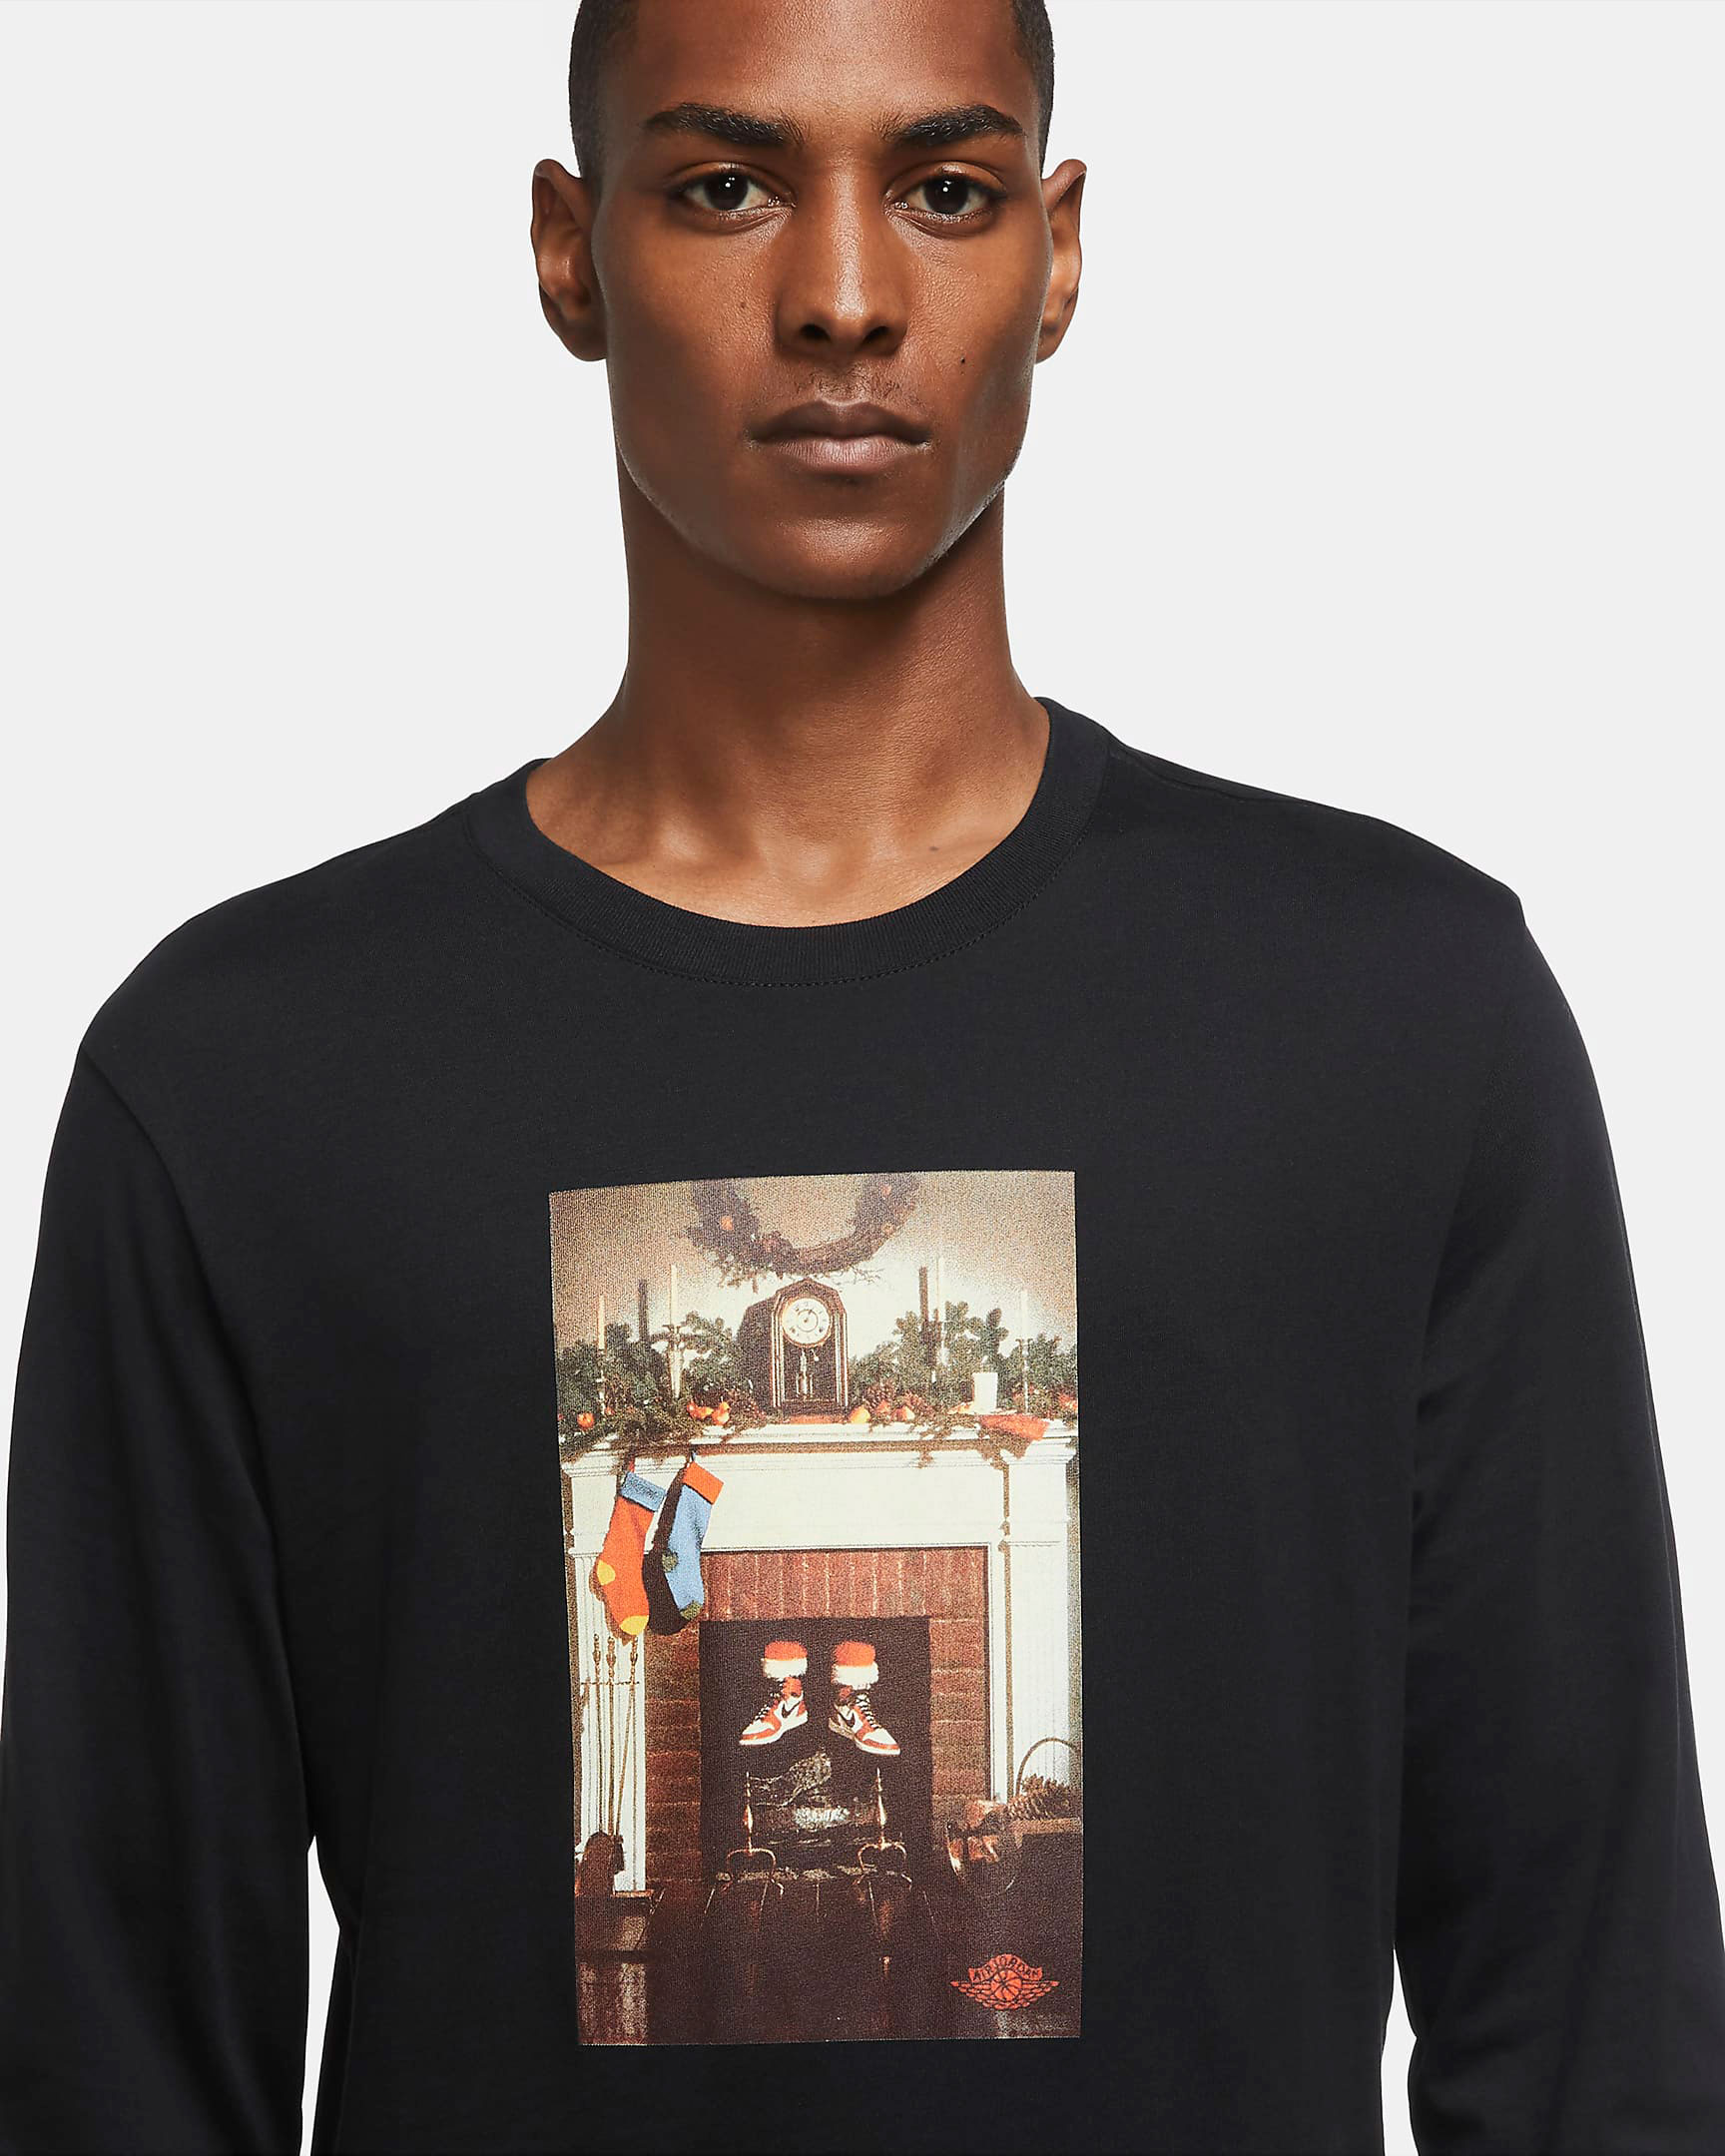 jordan-santa-chimney-holiday-long-sleeve-shirt-black-2